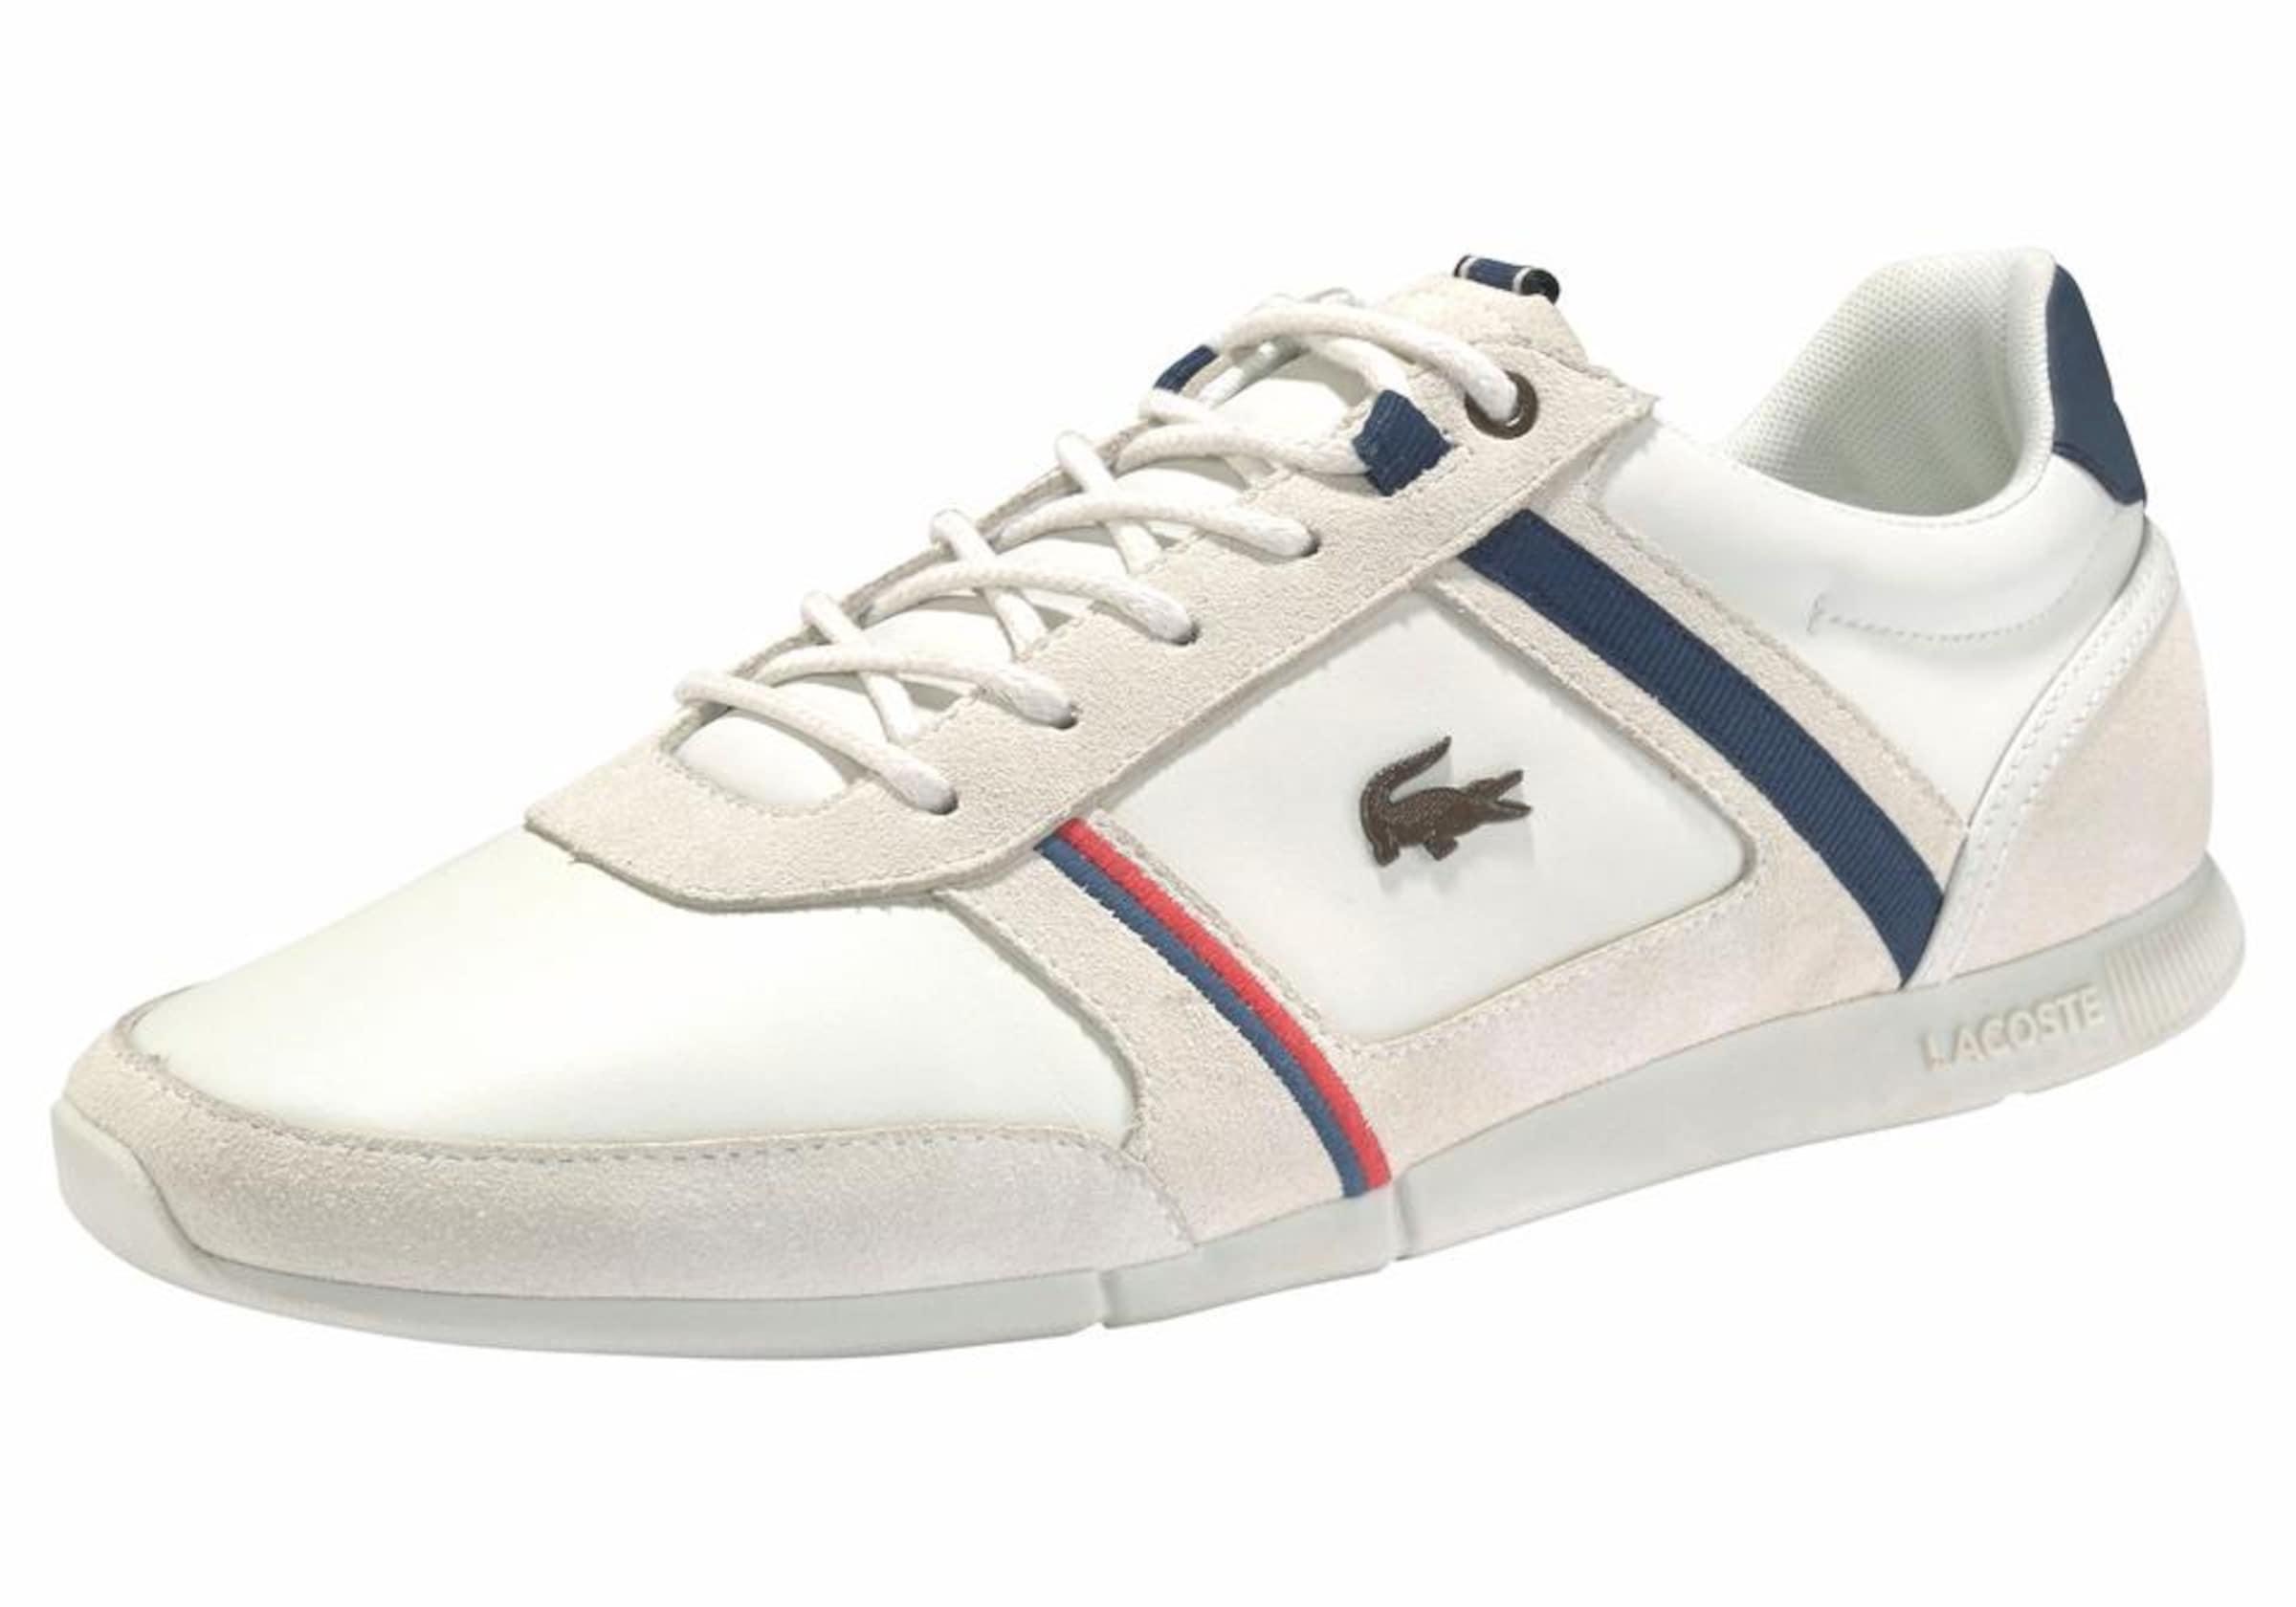 Couche De Chaussures Lacoste Menerva 118 1 « Beige / Blanc VXkyPlmjz